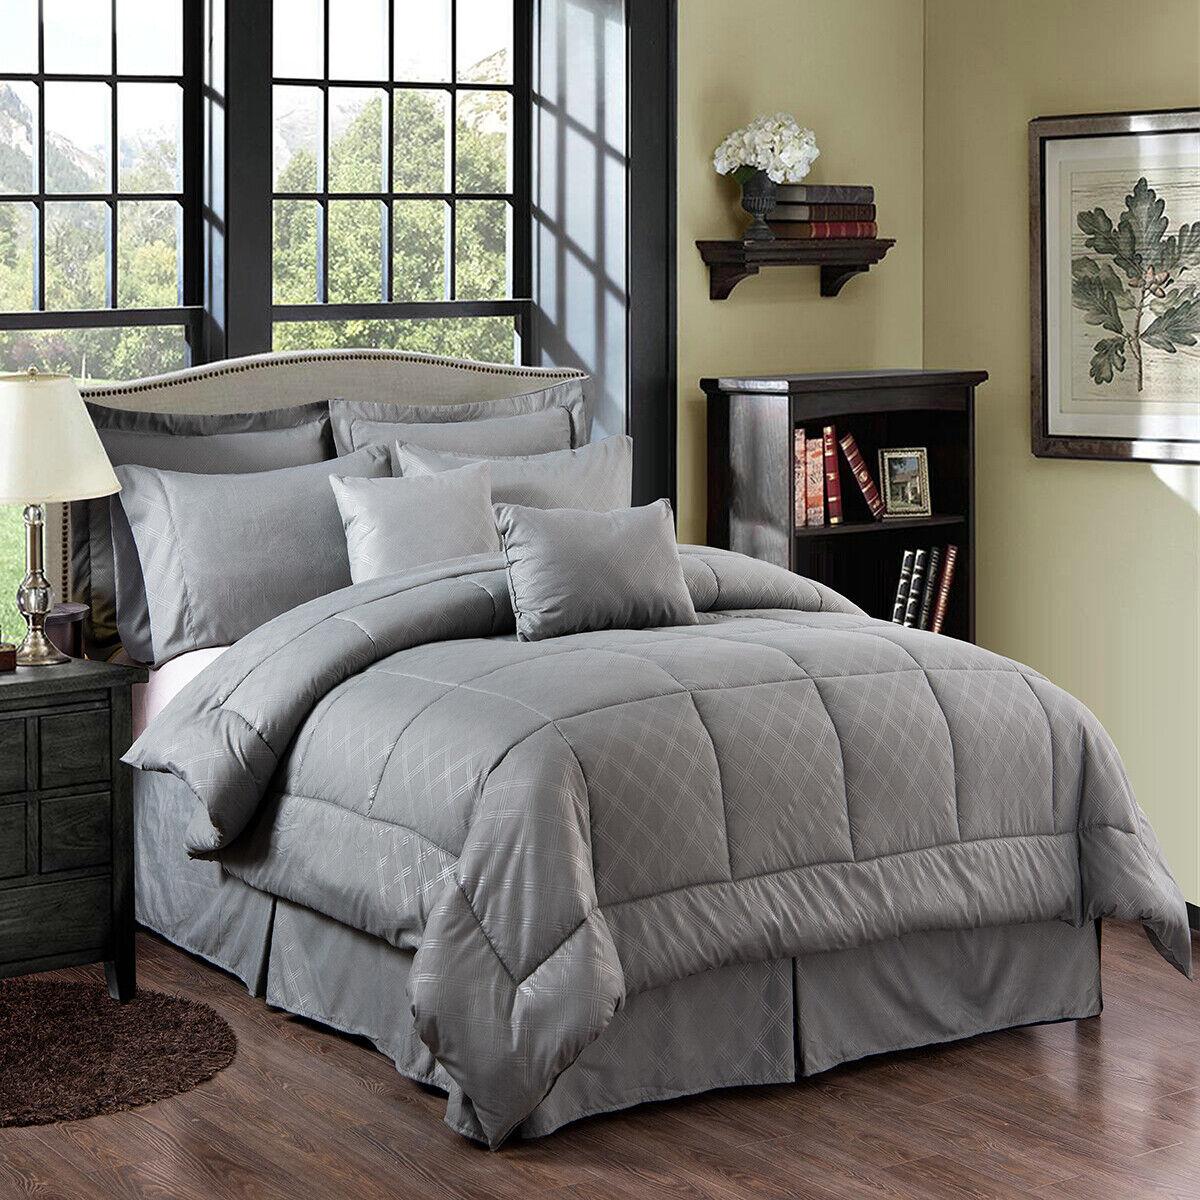 10 Piece Comforter Set Bedding W/Sheet Set Decorative Pillows Shams